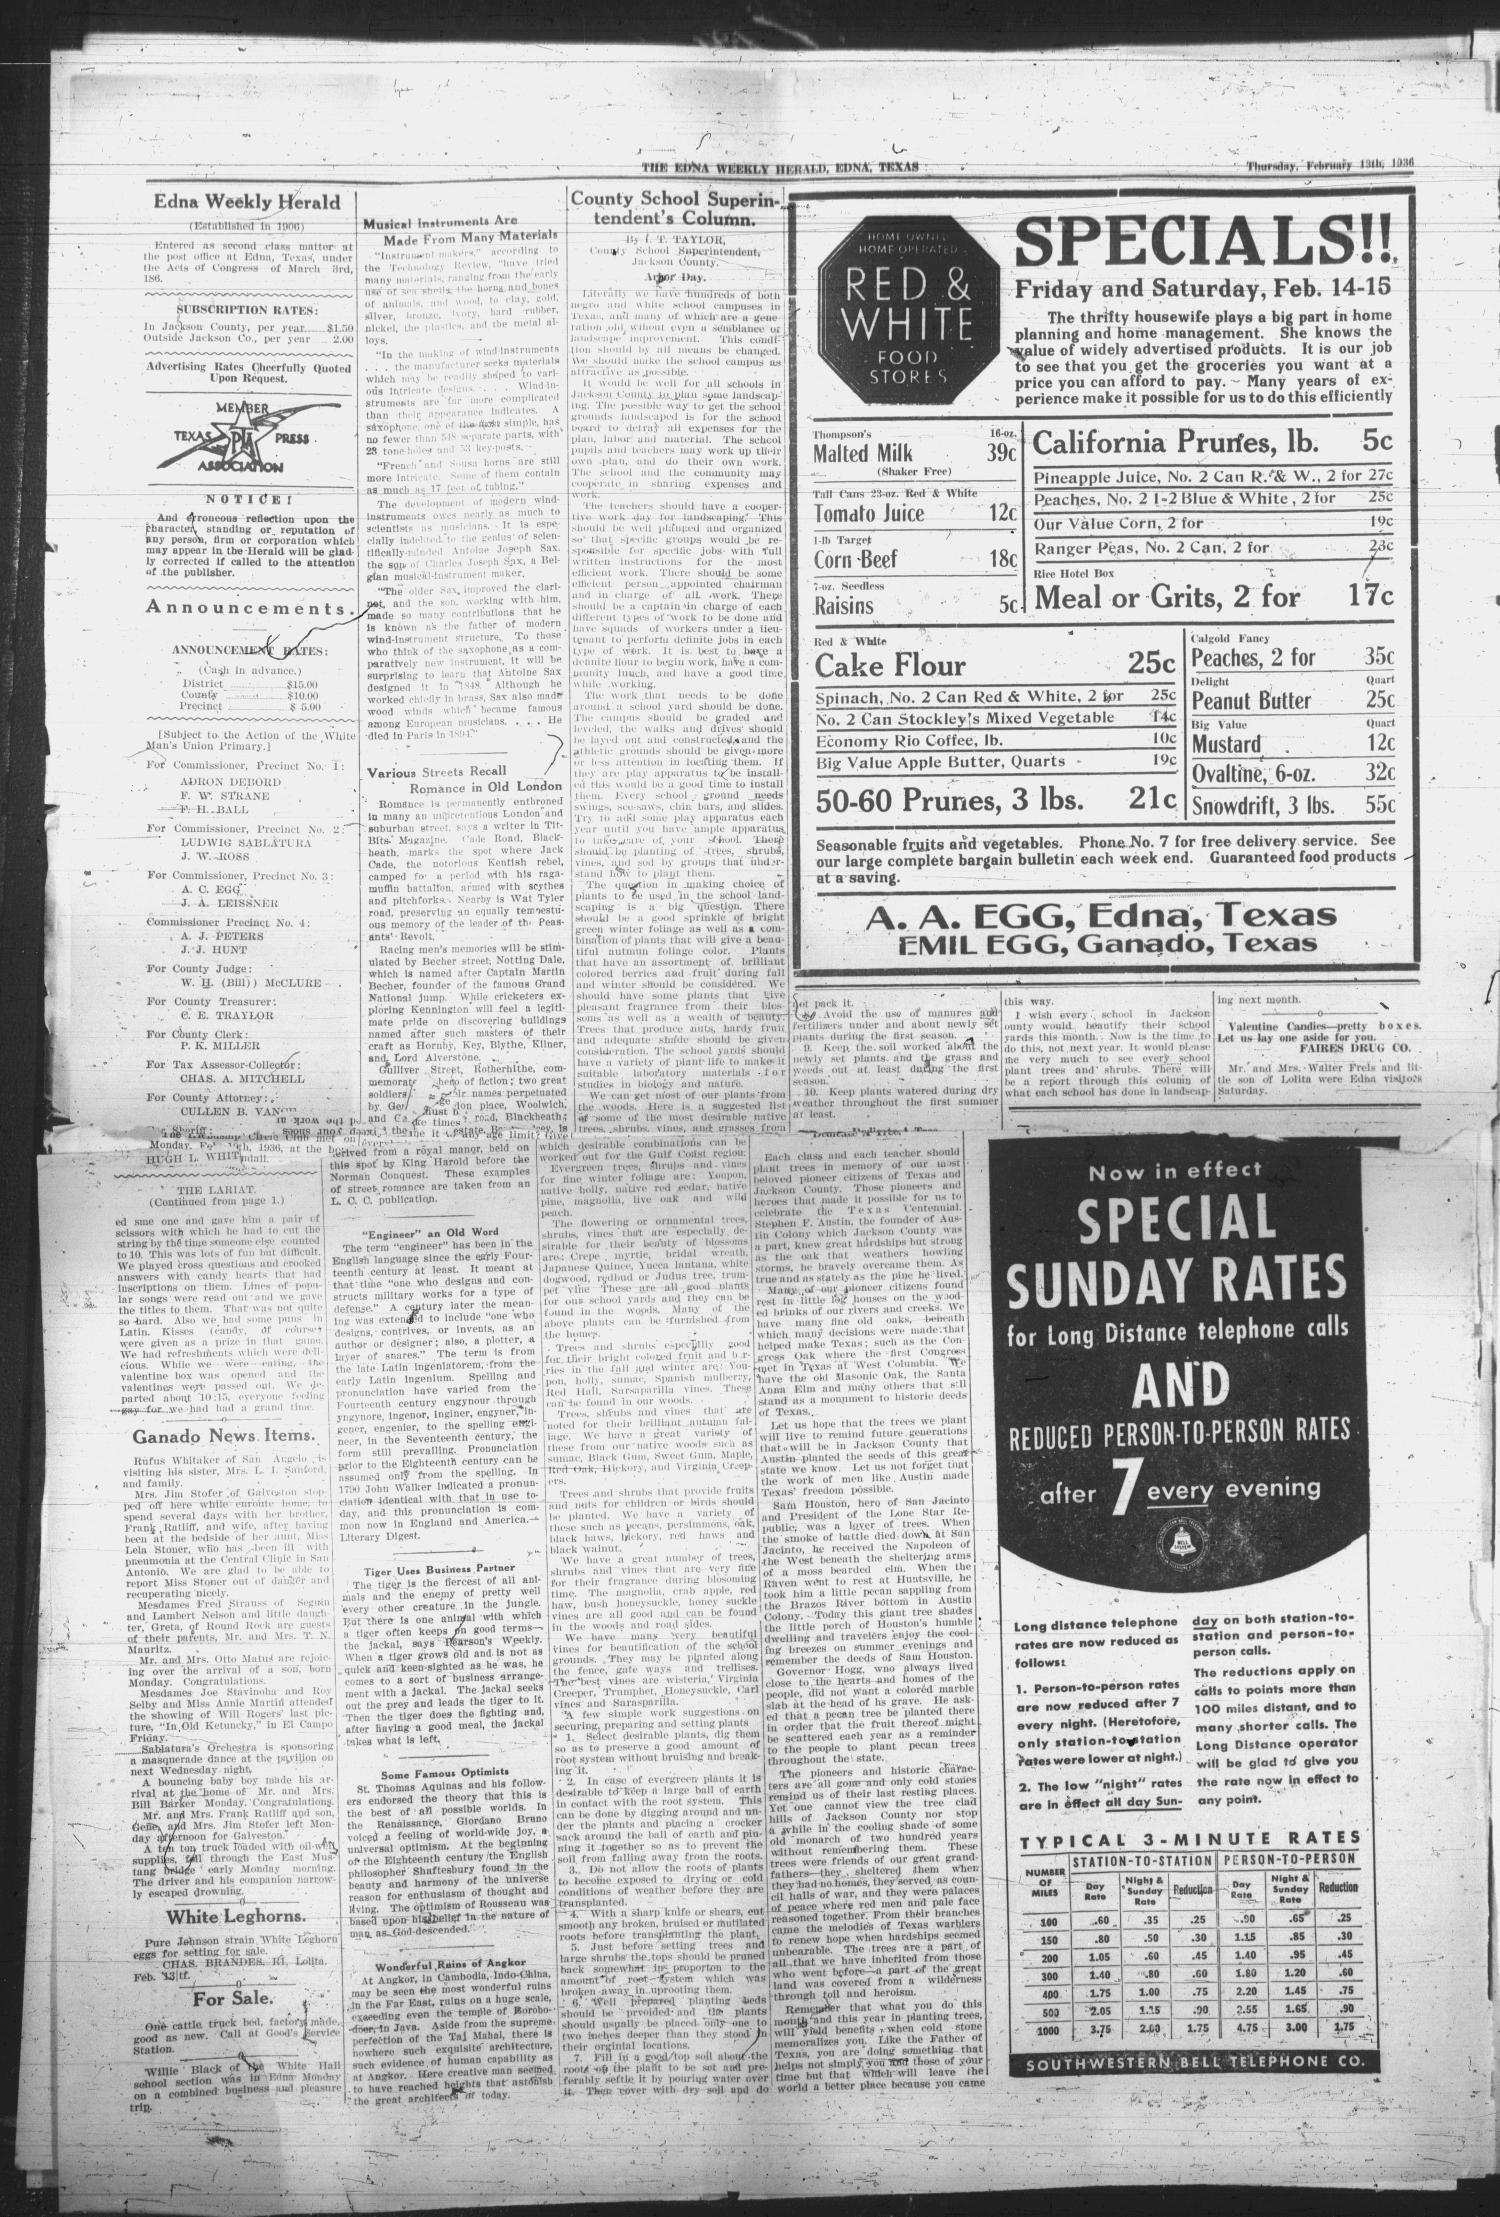 Edna Weekly Herald  (Edna, Tex ), Vol  28, No  49, Ed  1